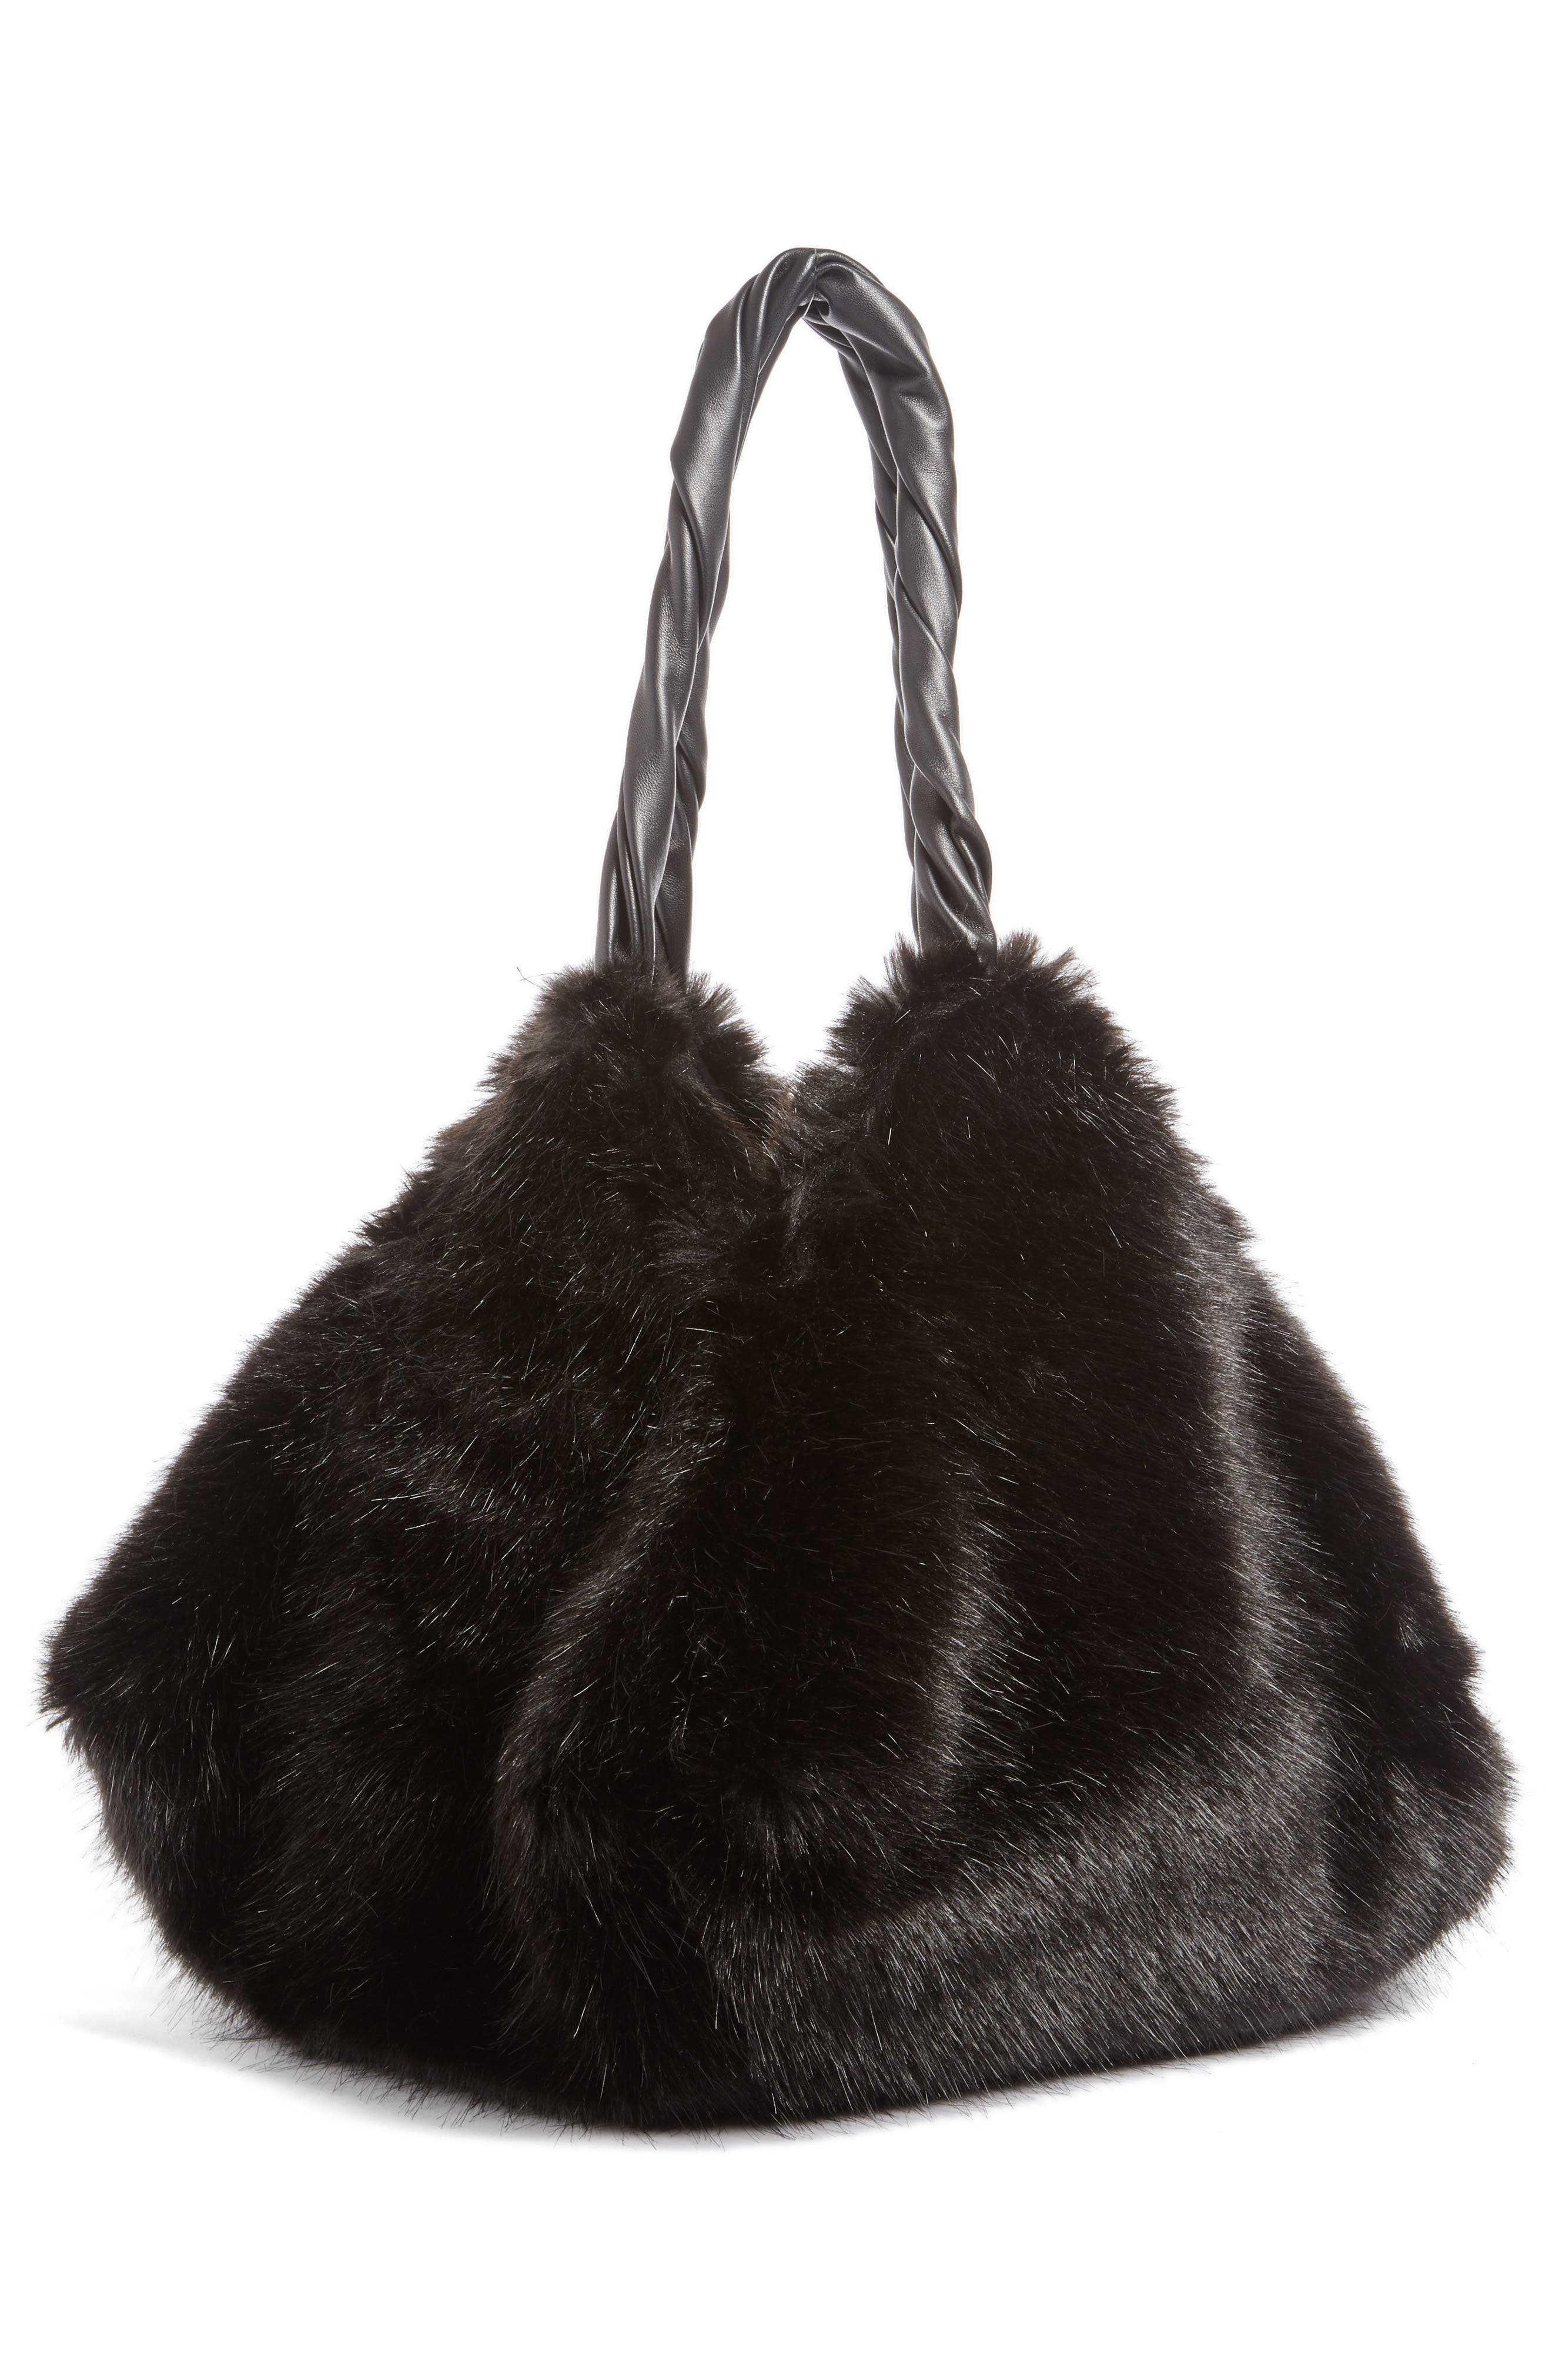 Pyramid Faux Fur Shoulder Bag,                             Alternate thumbnail 2, color,                             001